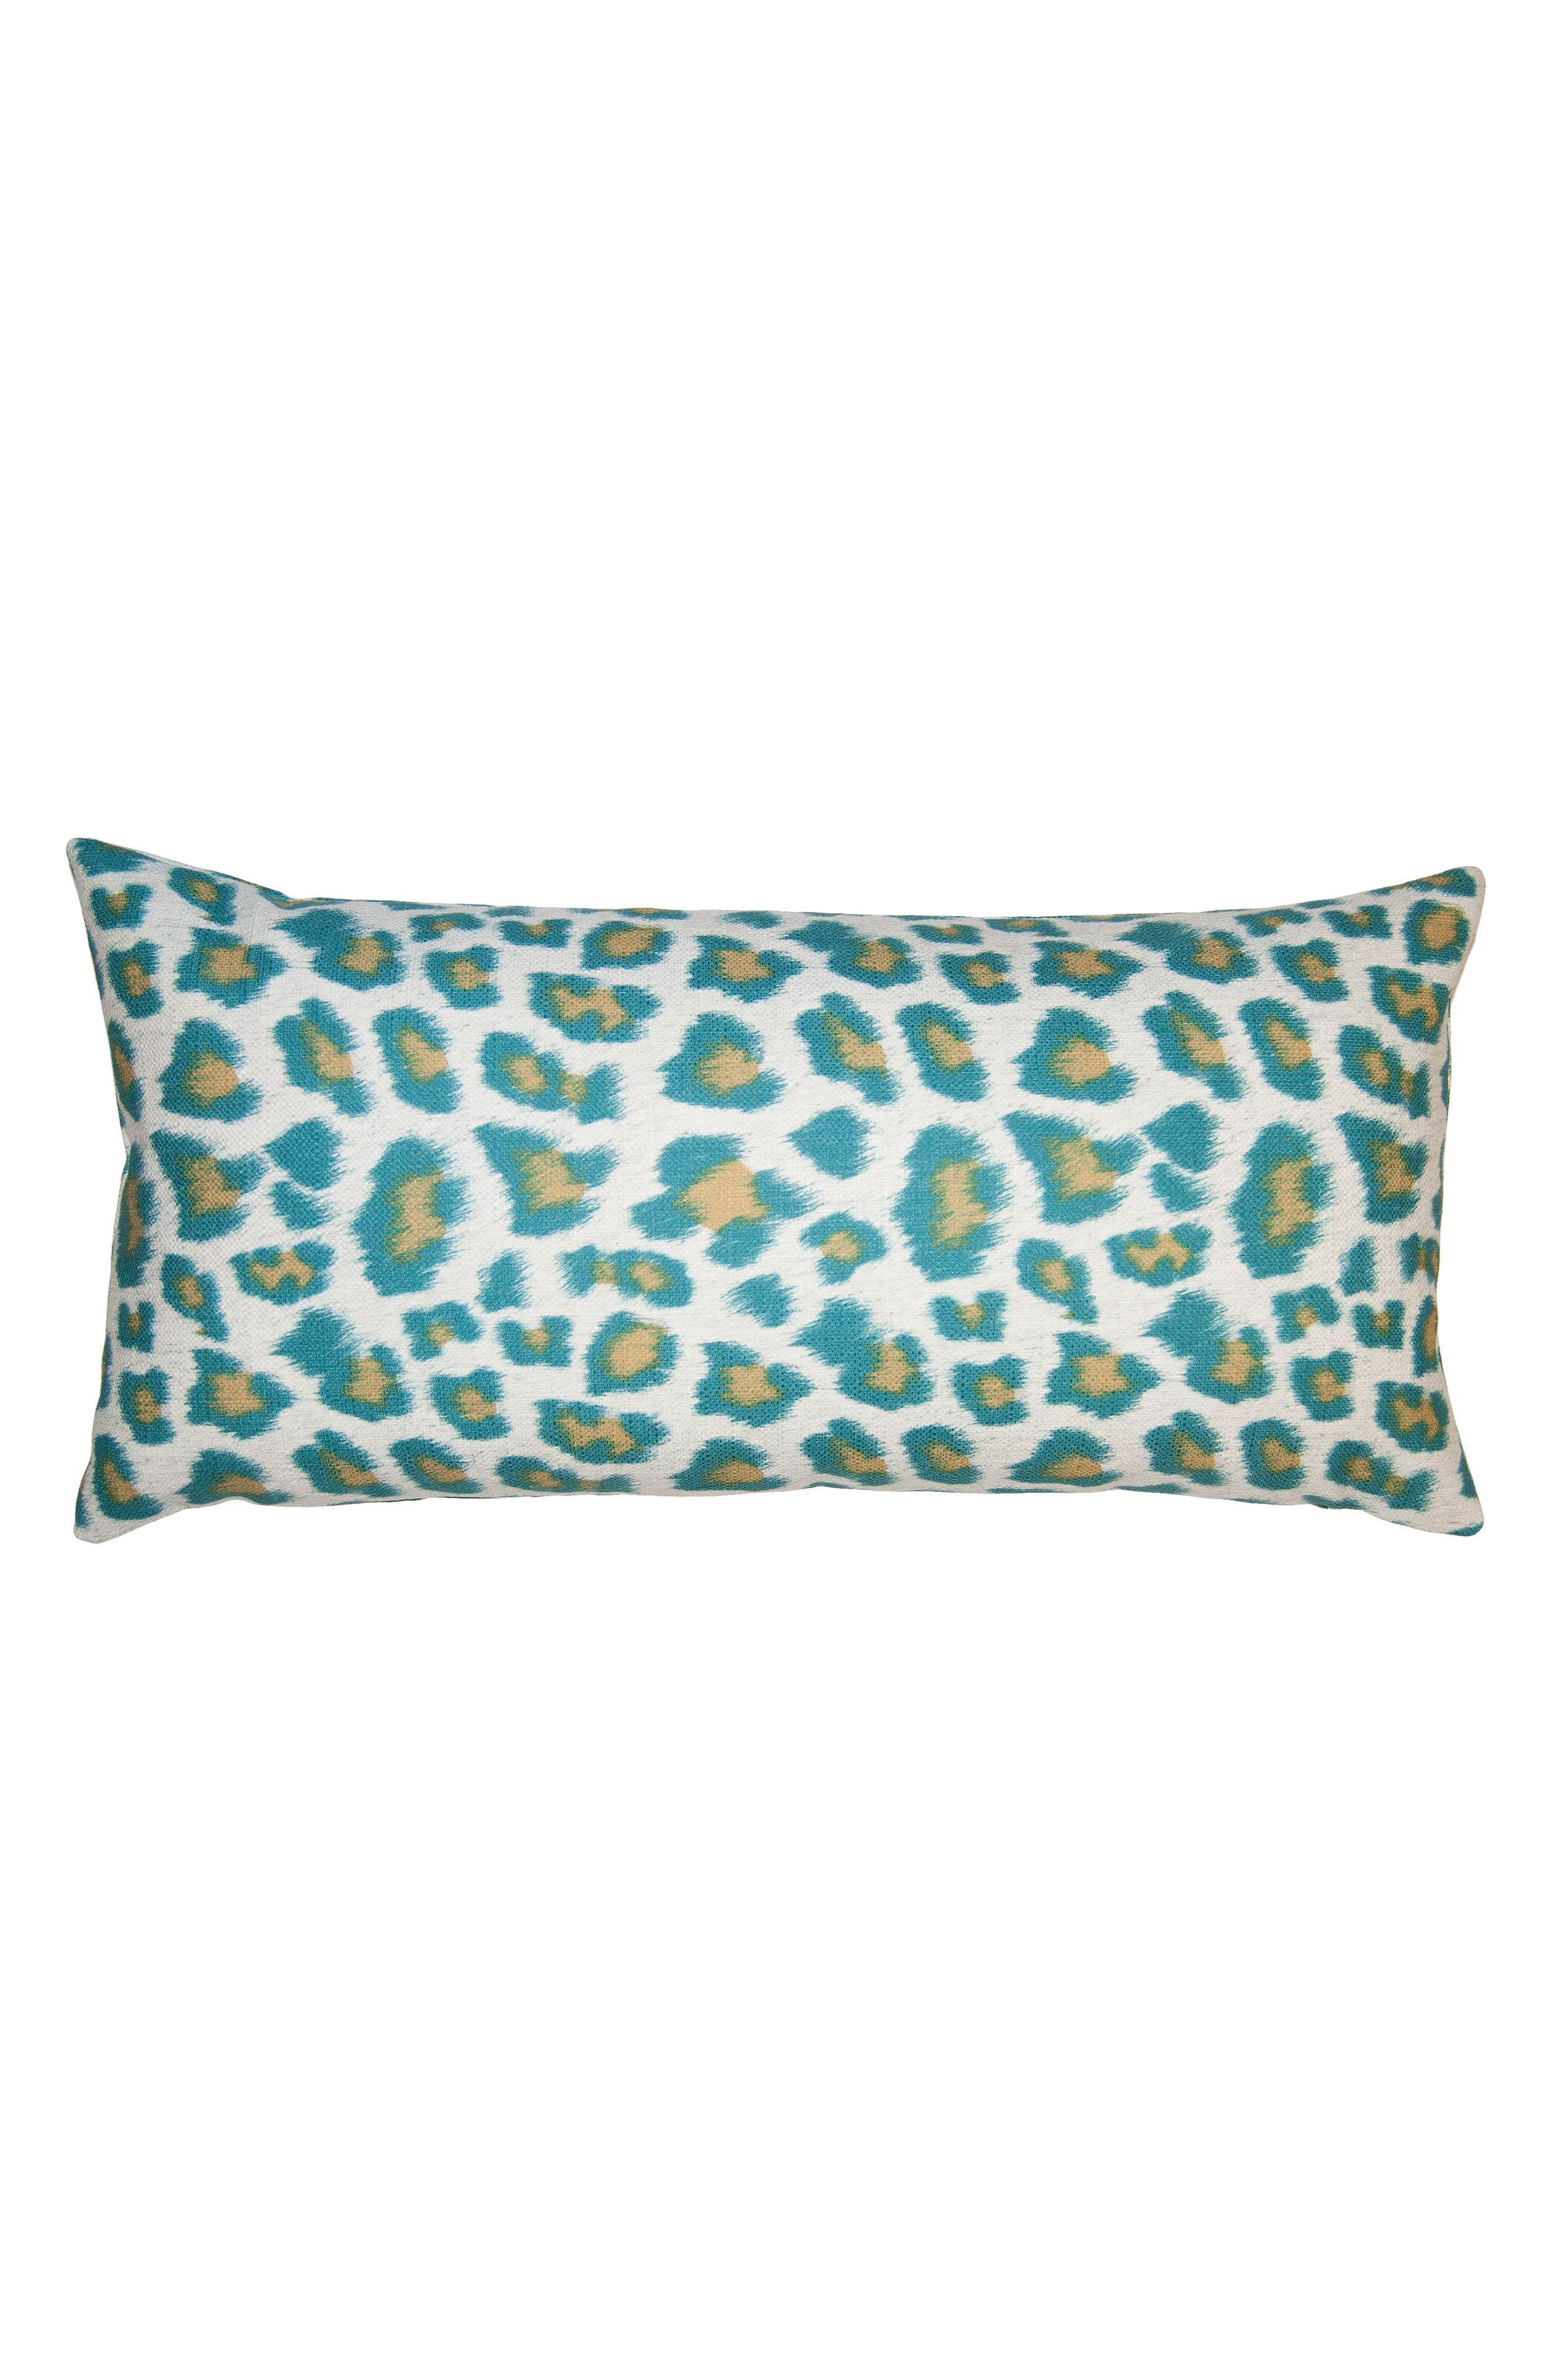 Riviera Cheetah Accent Pillow,                         Main,                         color, TEAL